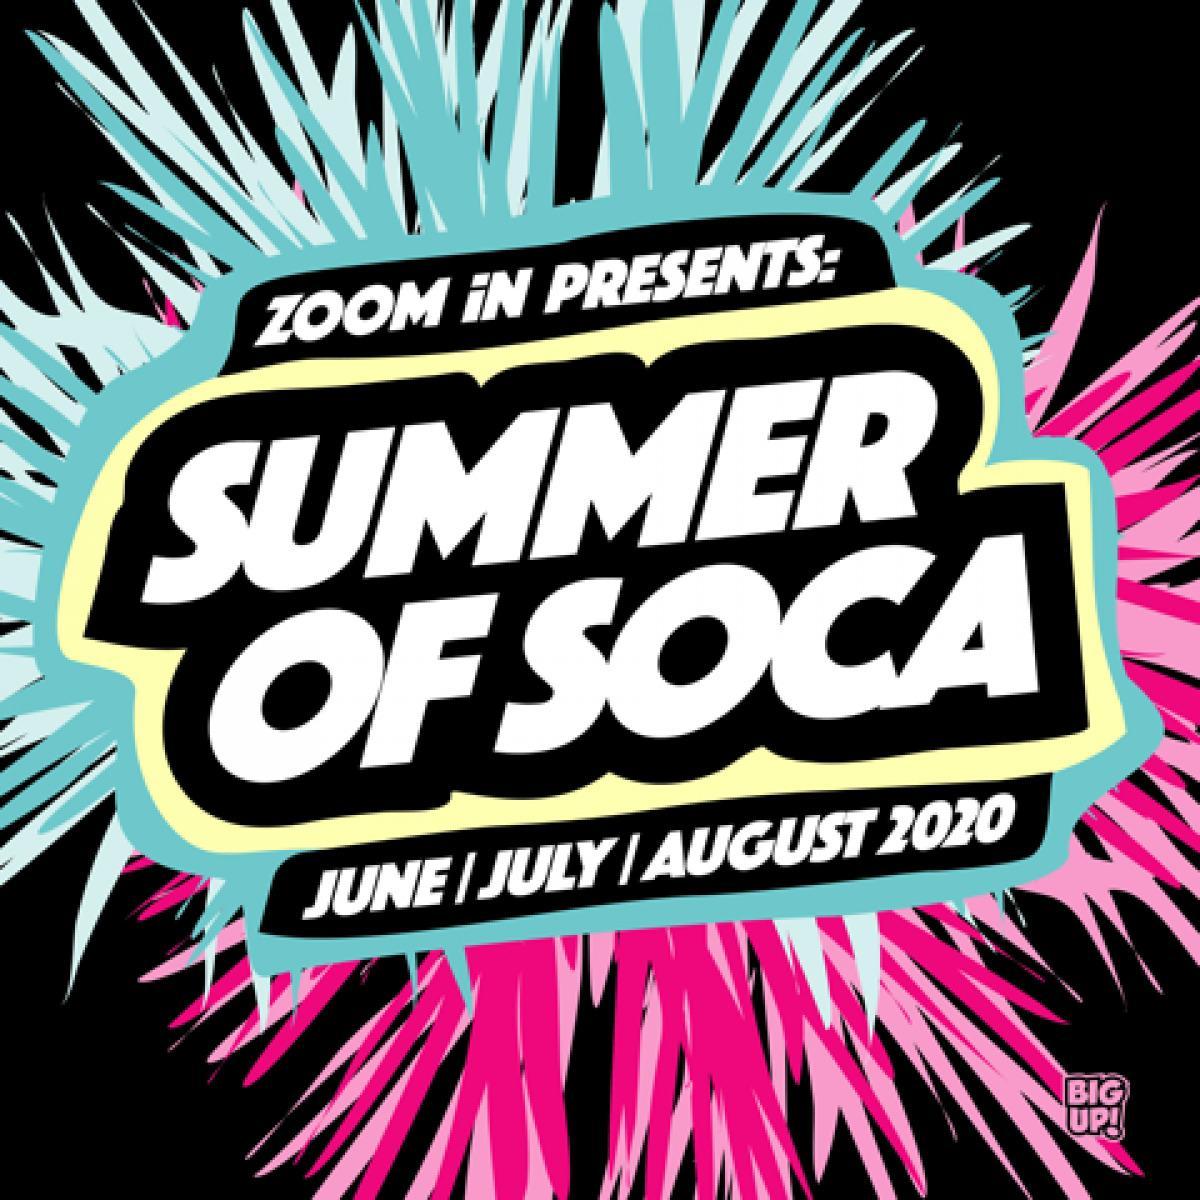 Summer Of Soca - Dutch Soca Lover Edition flyer or graphic.